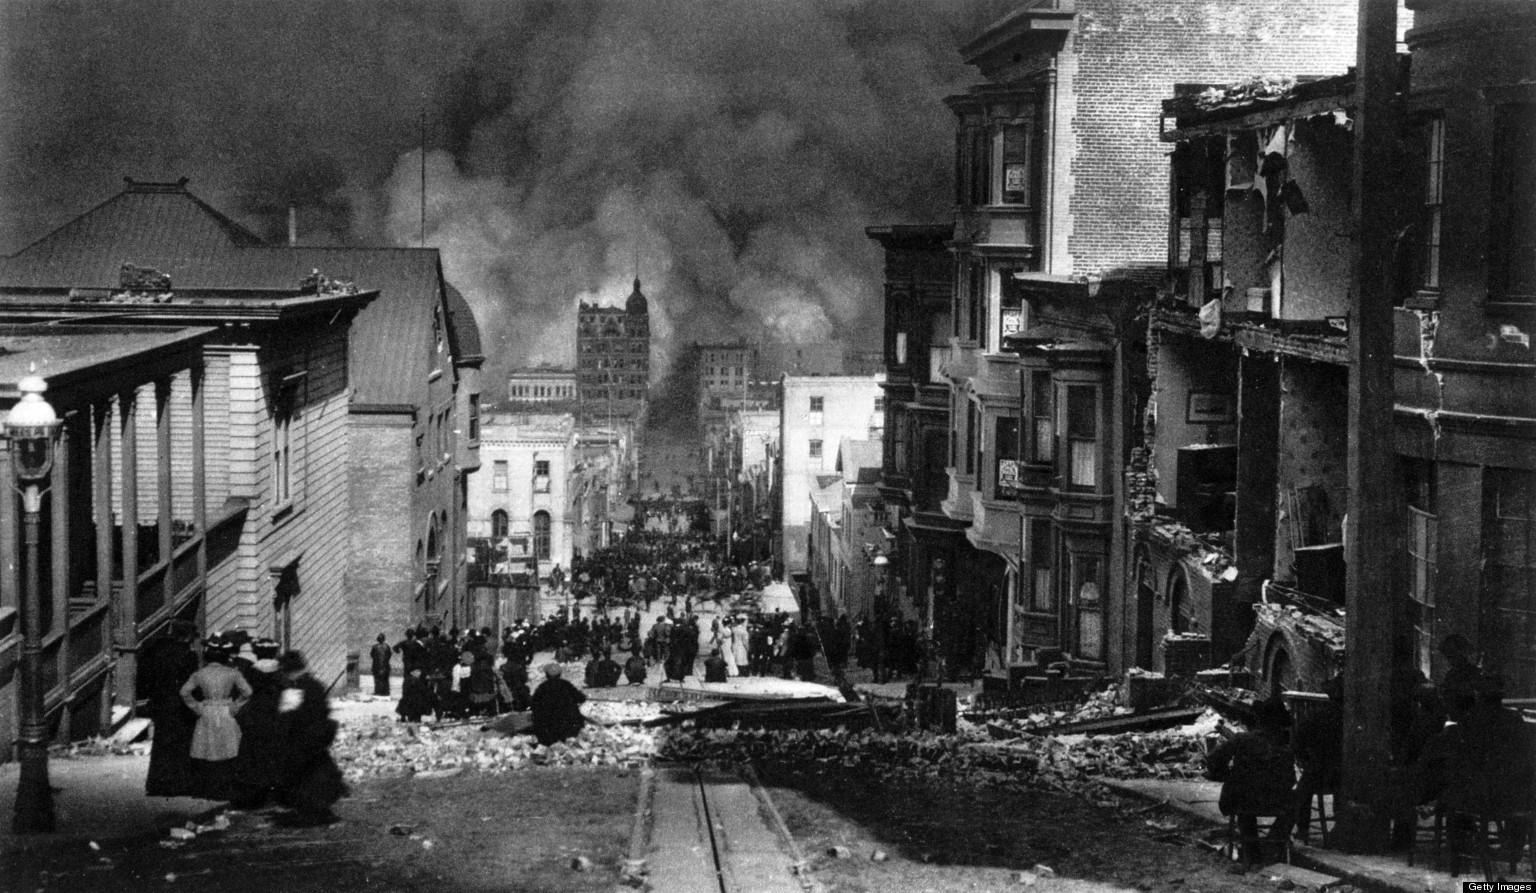 San Francisco 1906 Earthquake Anniversary Remembering